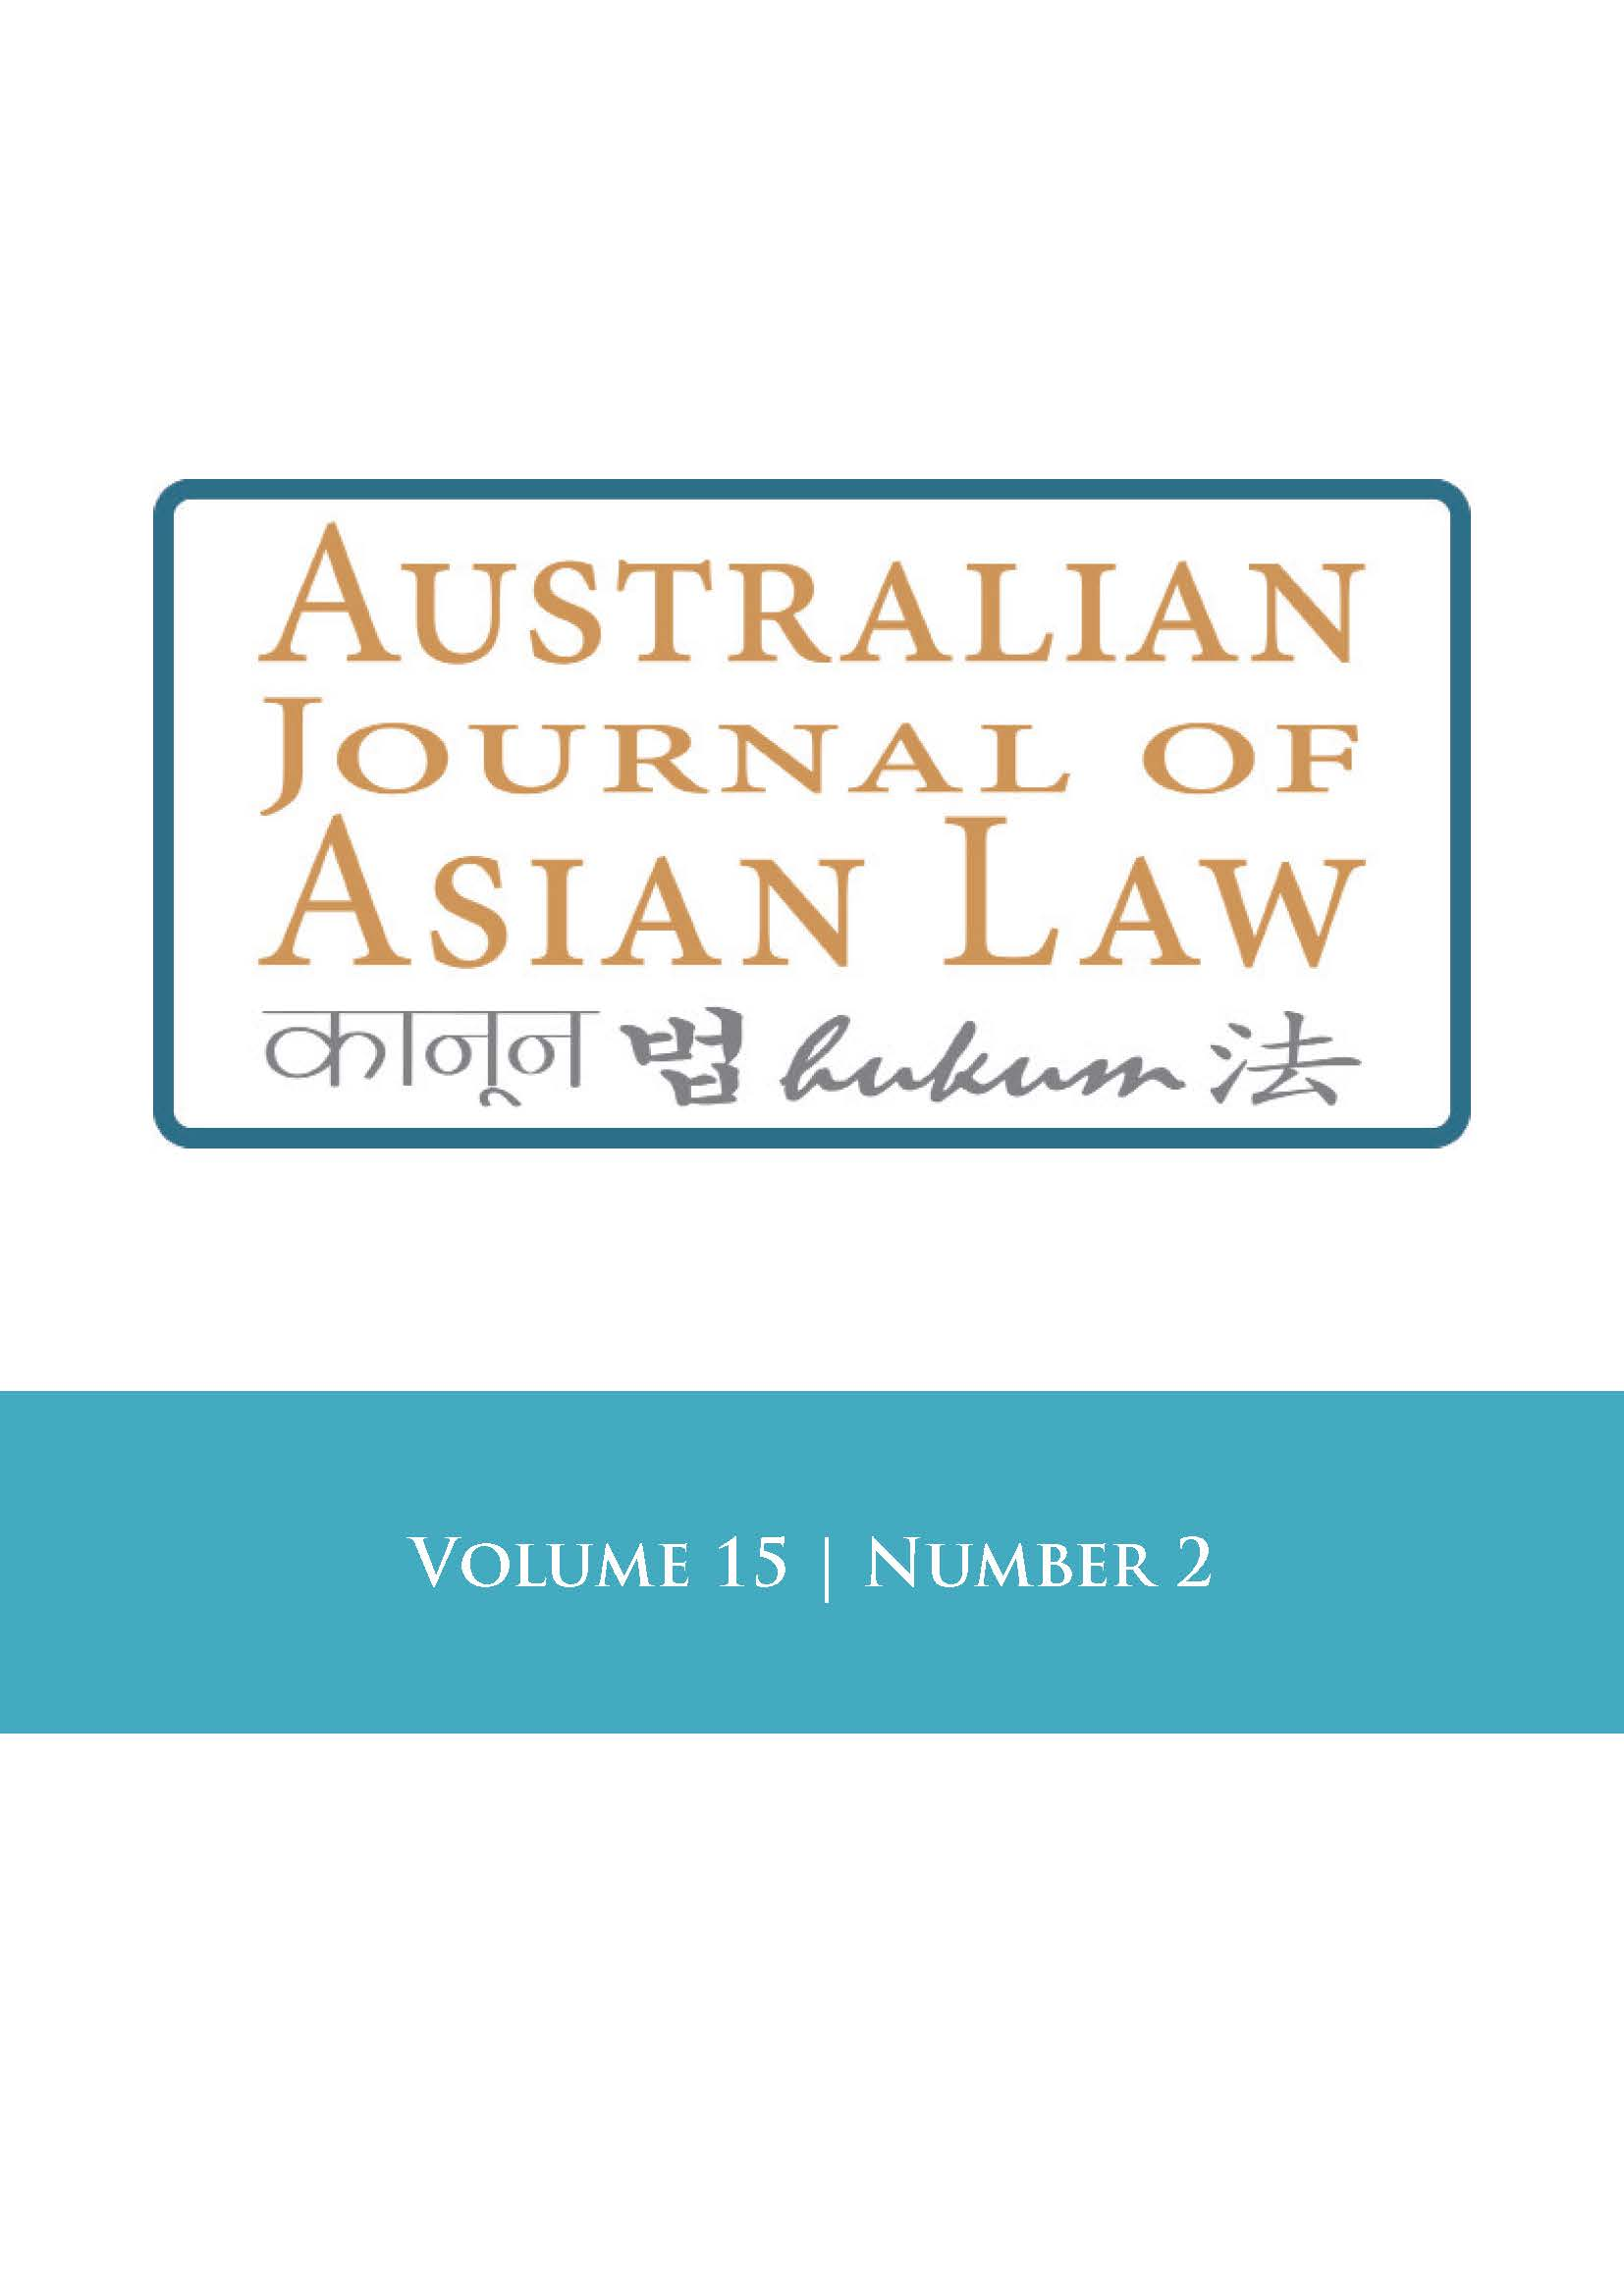 Australian Journal of Asian Law (Volume 15 Number 2)